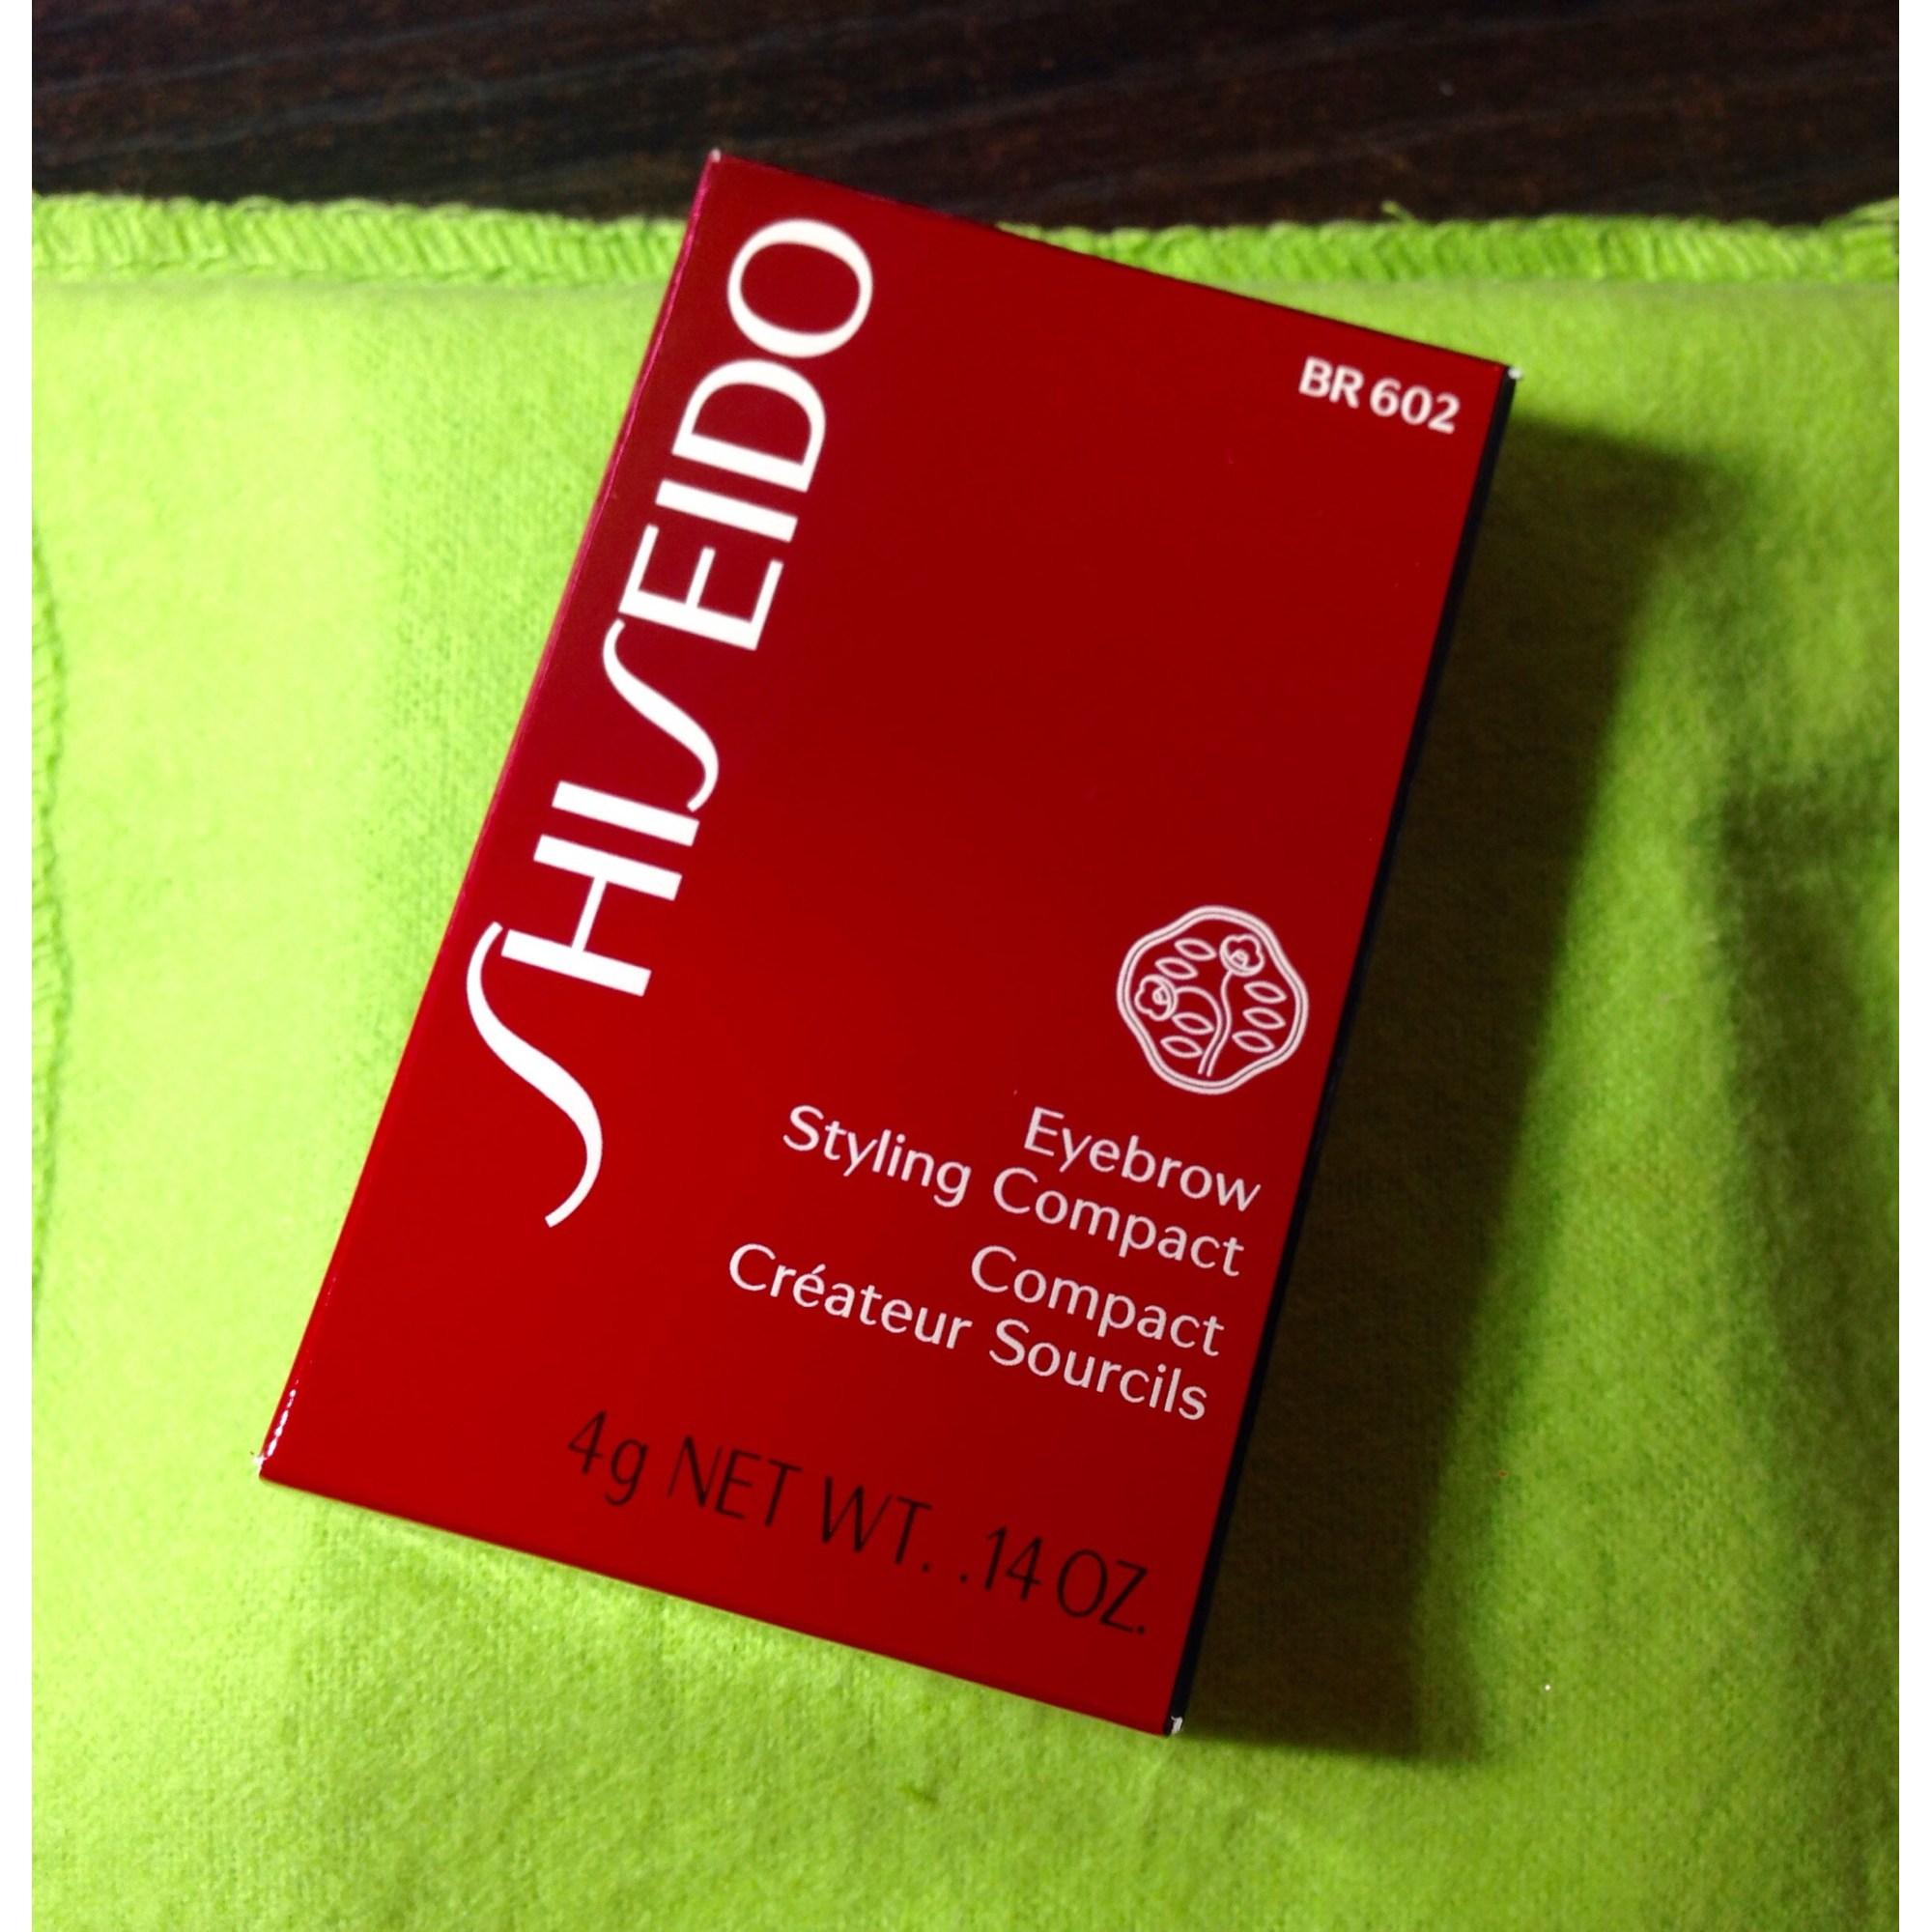 Kit de maquillage SHISEIDO BR602